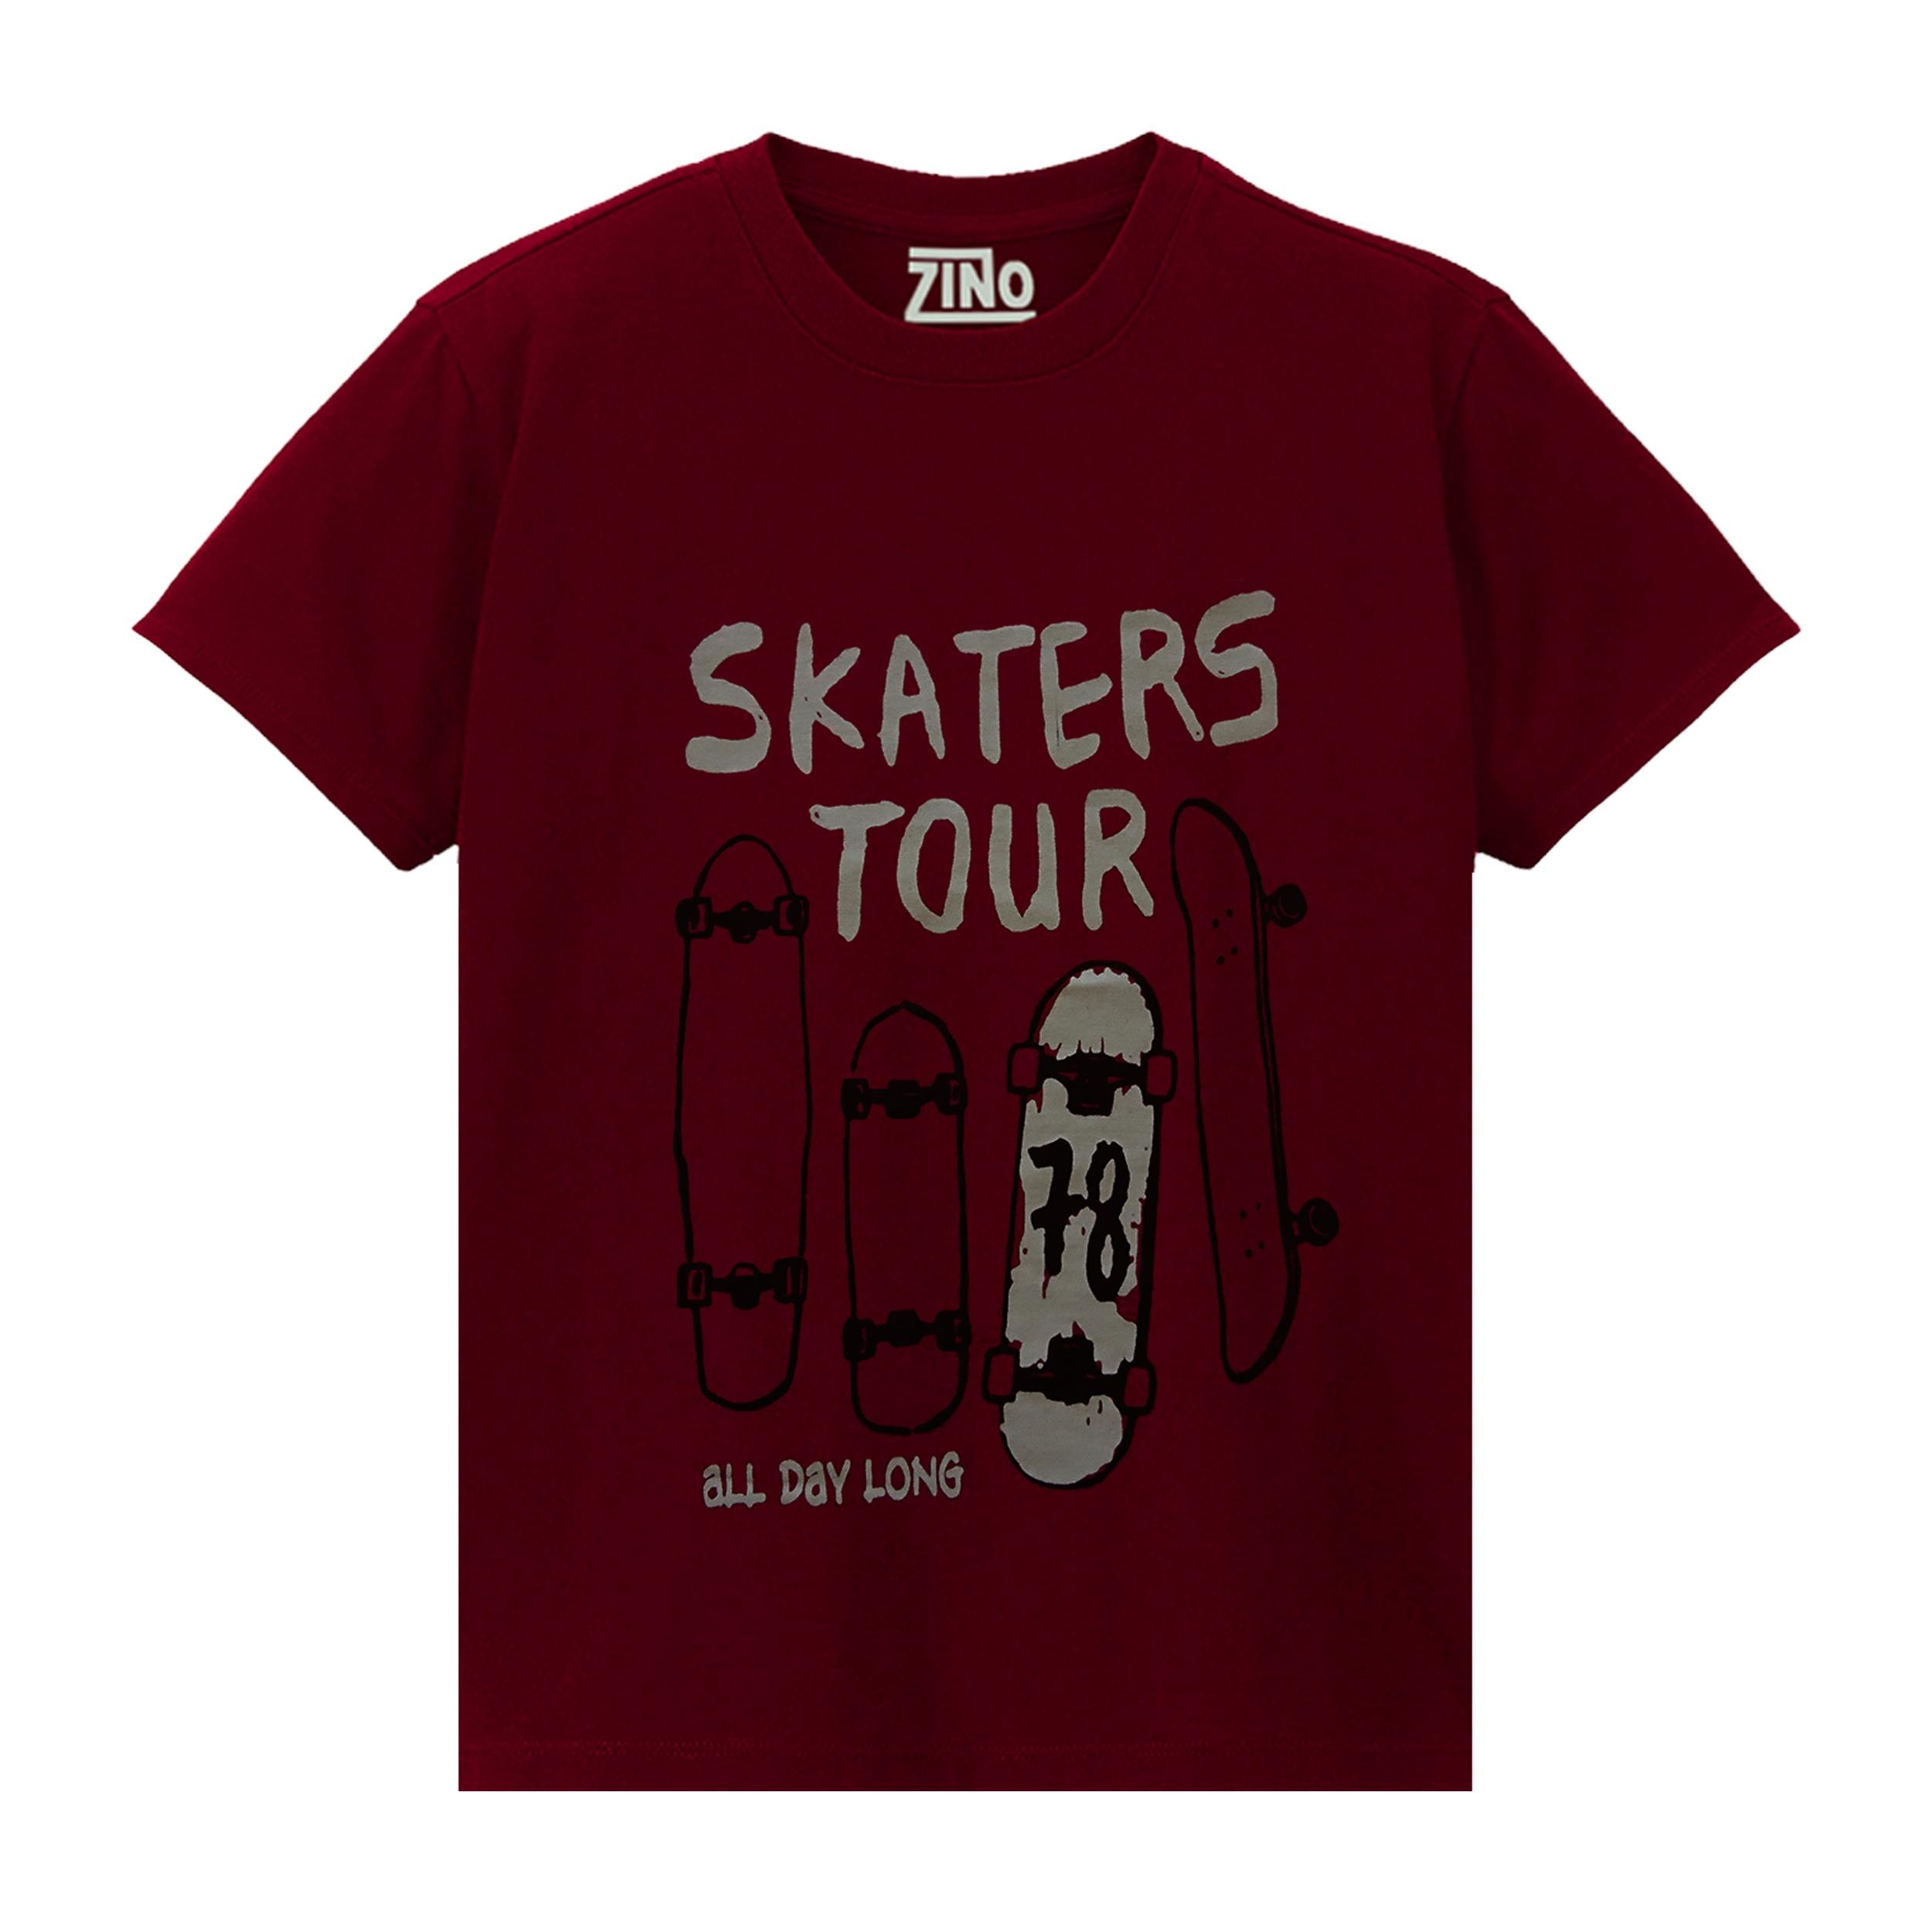 تی شرت پسرانه زینو طرح Skaters رنگ زرشکی